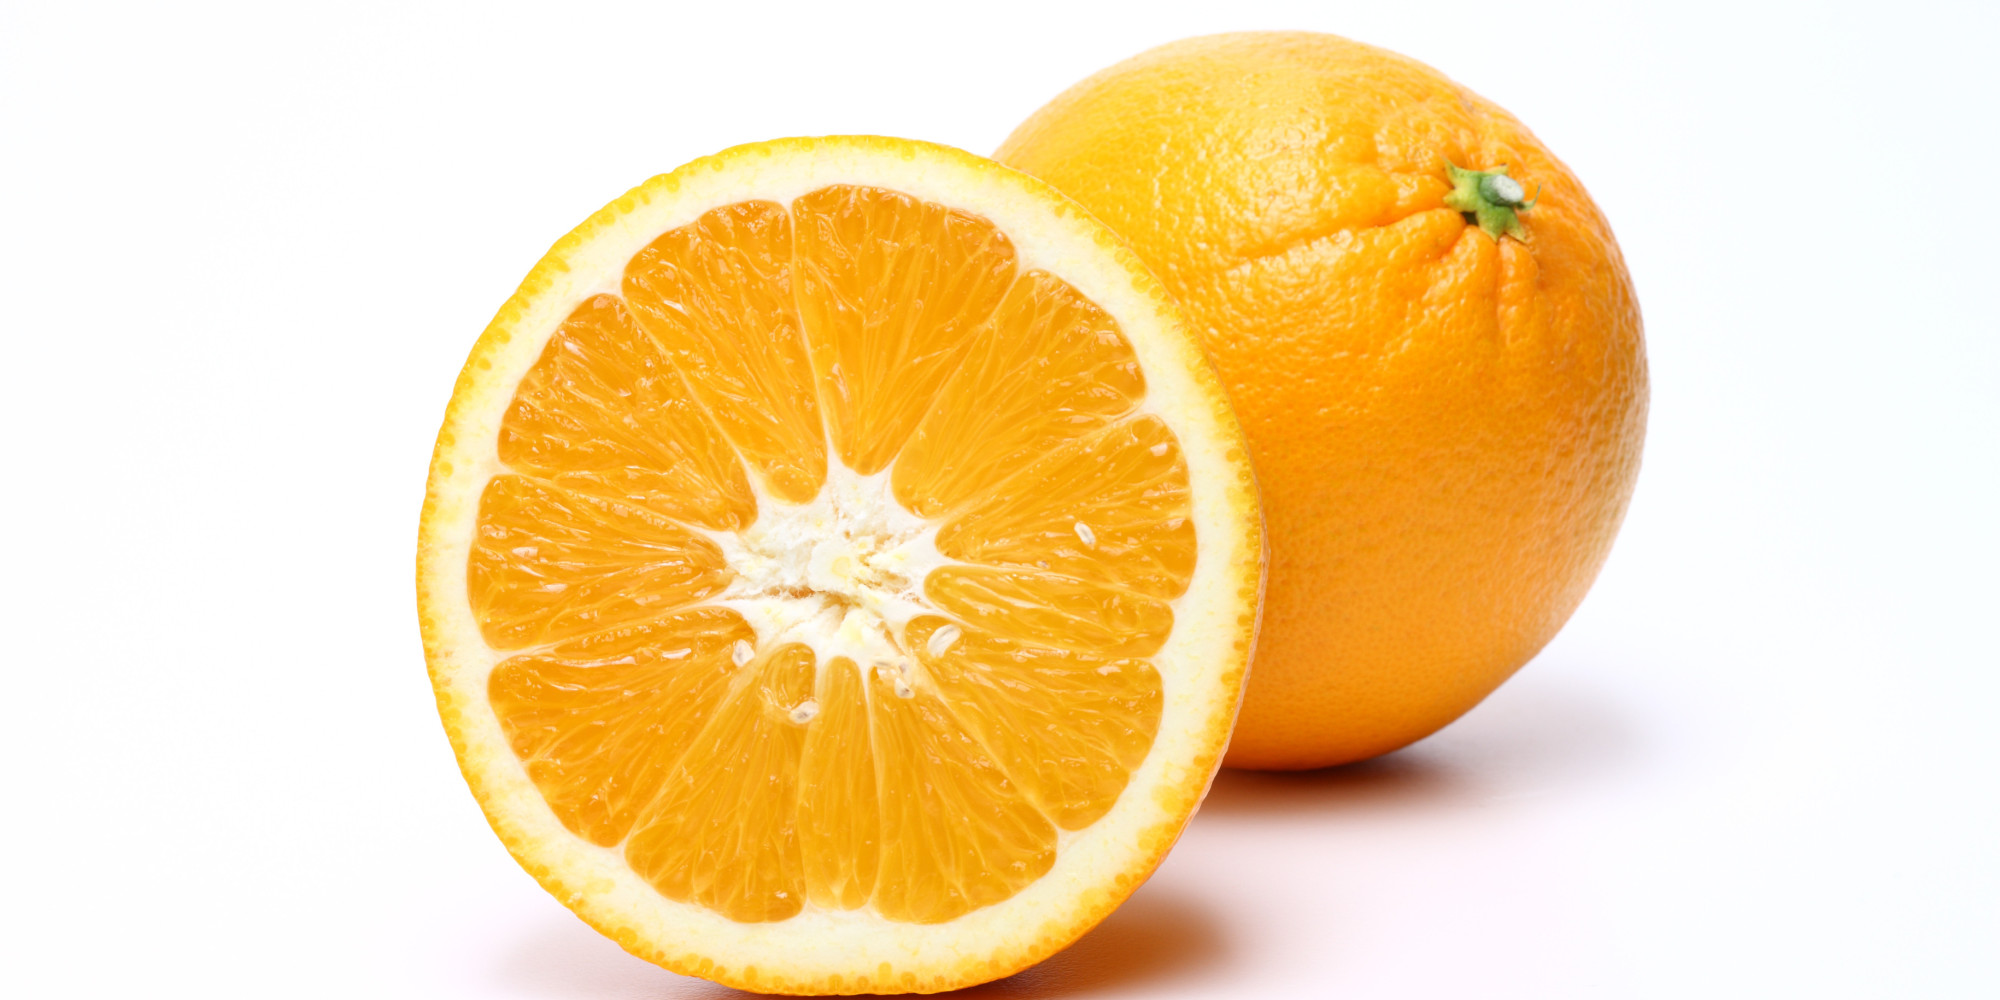 Peeled juicy oranges photo